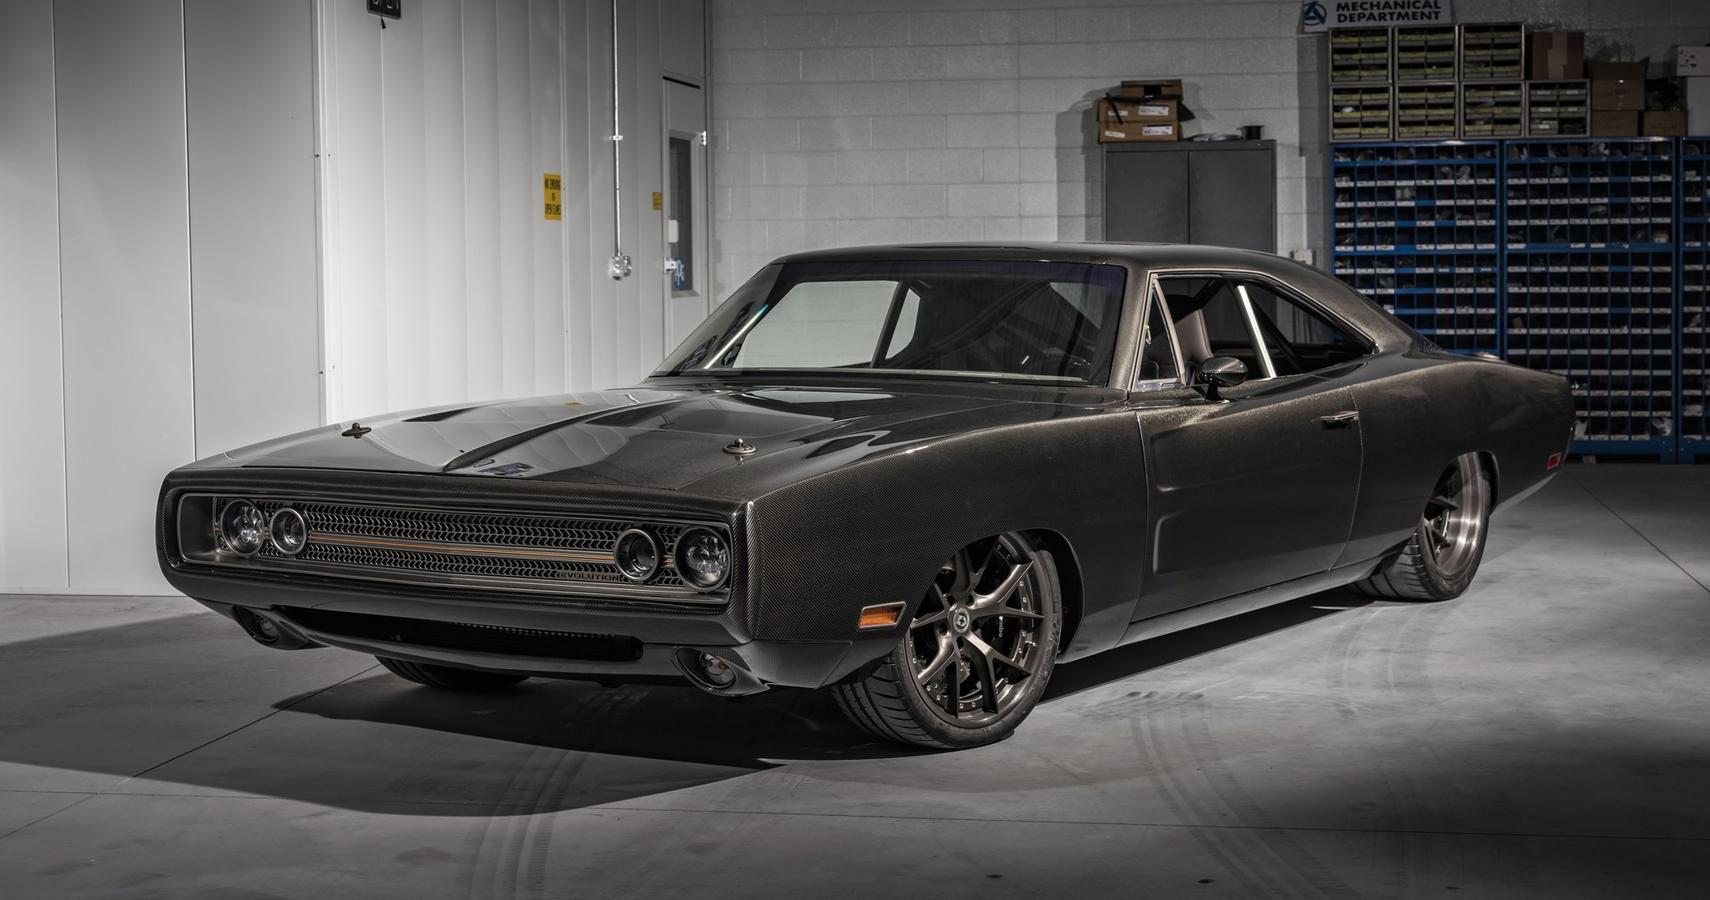 SpeedKore Put A Demon Engine Inside Its Carbon Fiber-Clad 1970 Dodge Charger